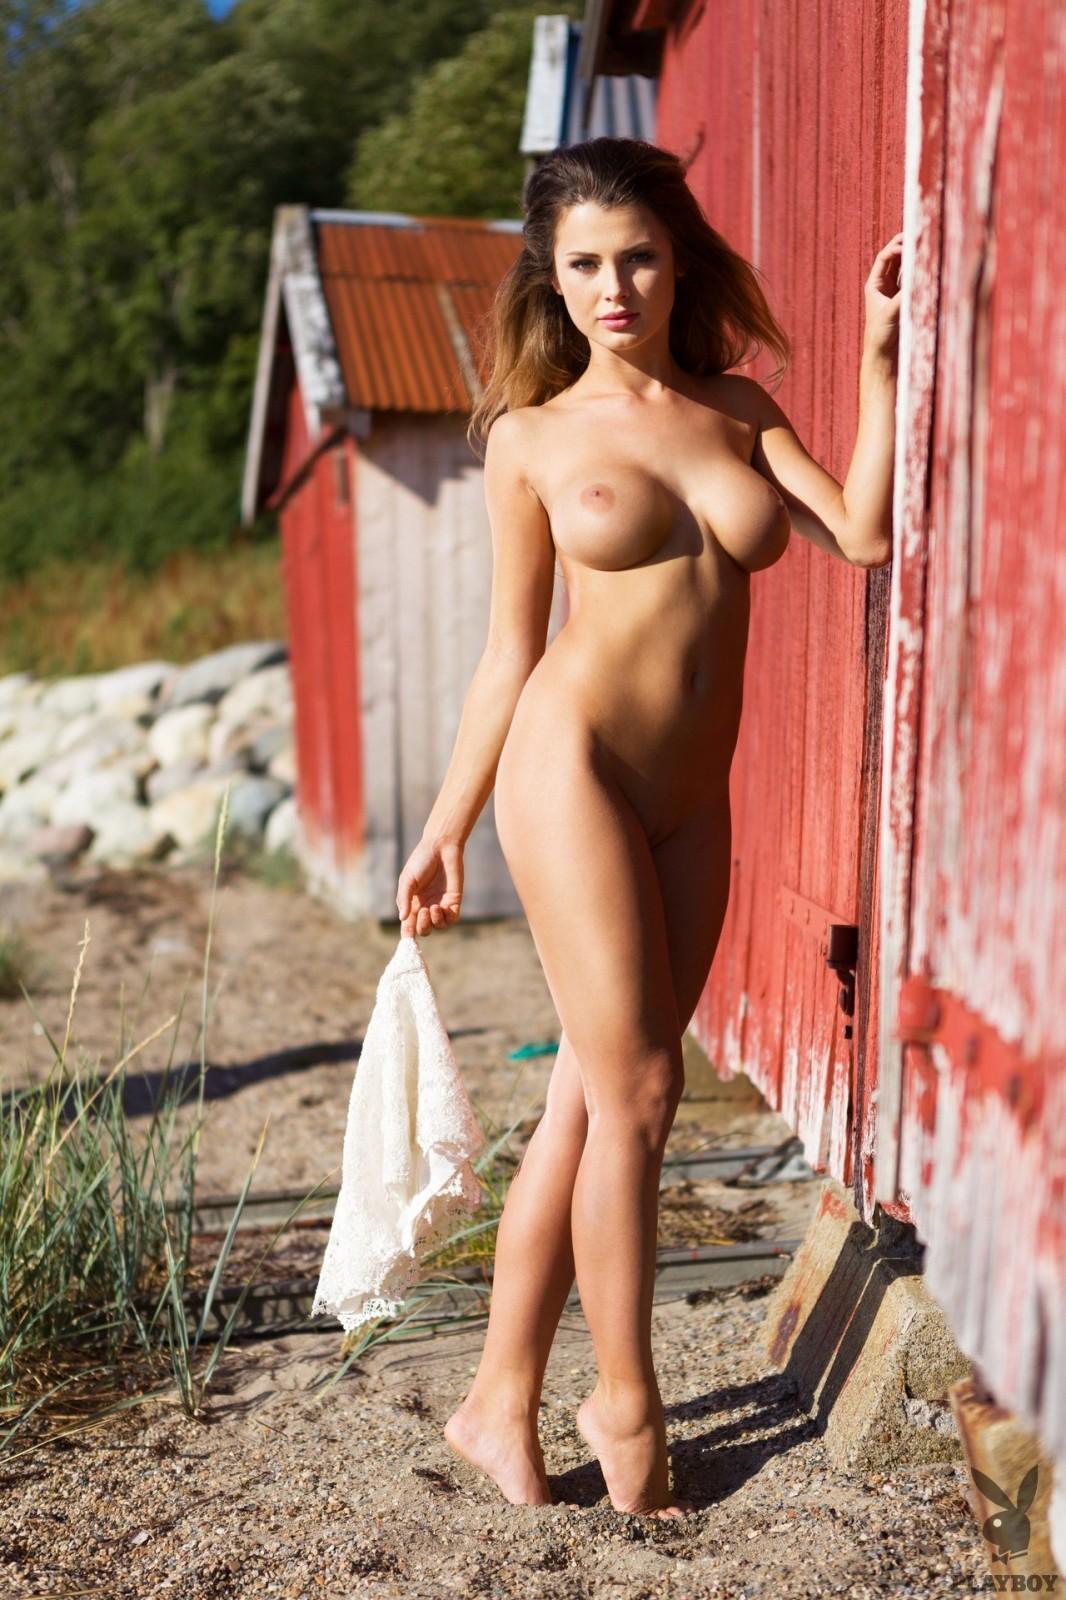 XXX Klaudia Skogmo nude (83 foto and video), Ass, Paparazzi, Instagram, cameltoe 2017